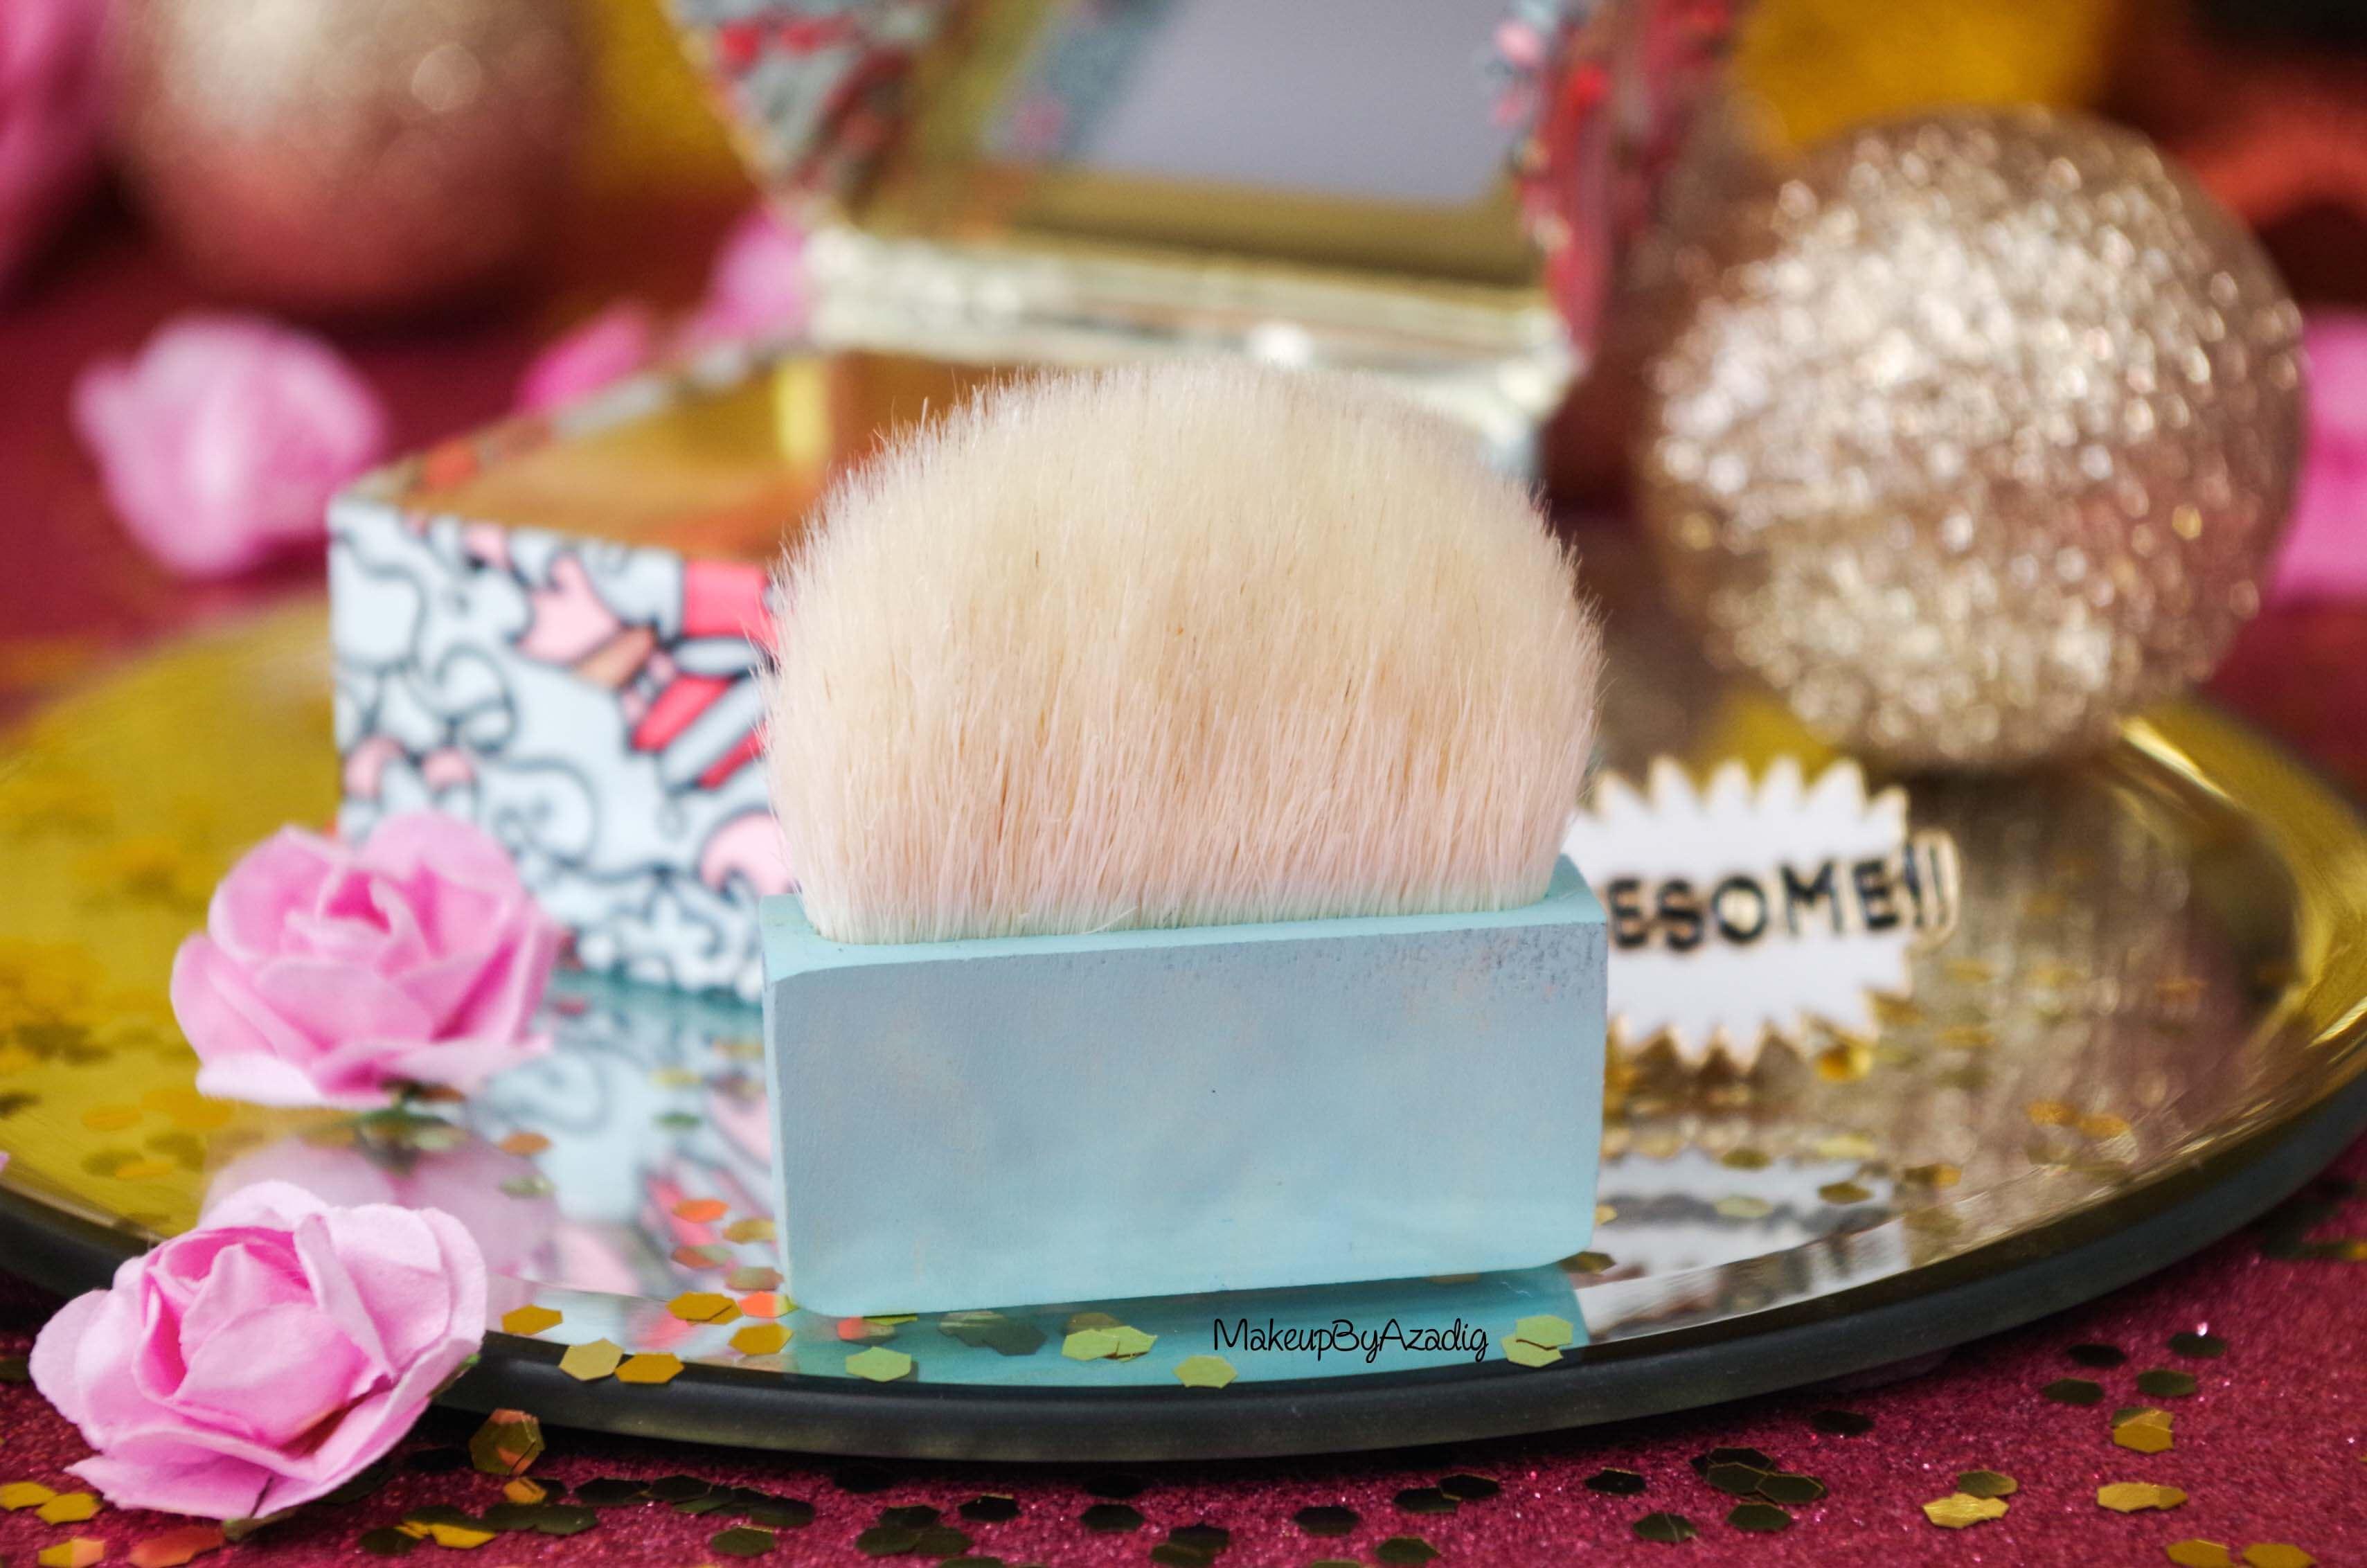 promo-revue-review-blush-benefit-galifornia-san-francisco-sunny-golden-pink-blush-avis-prix-sephora-makeupbyazadig-coachella